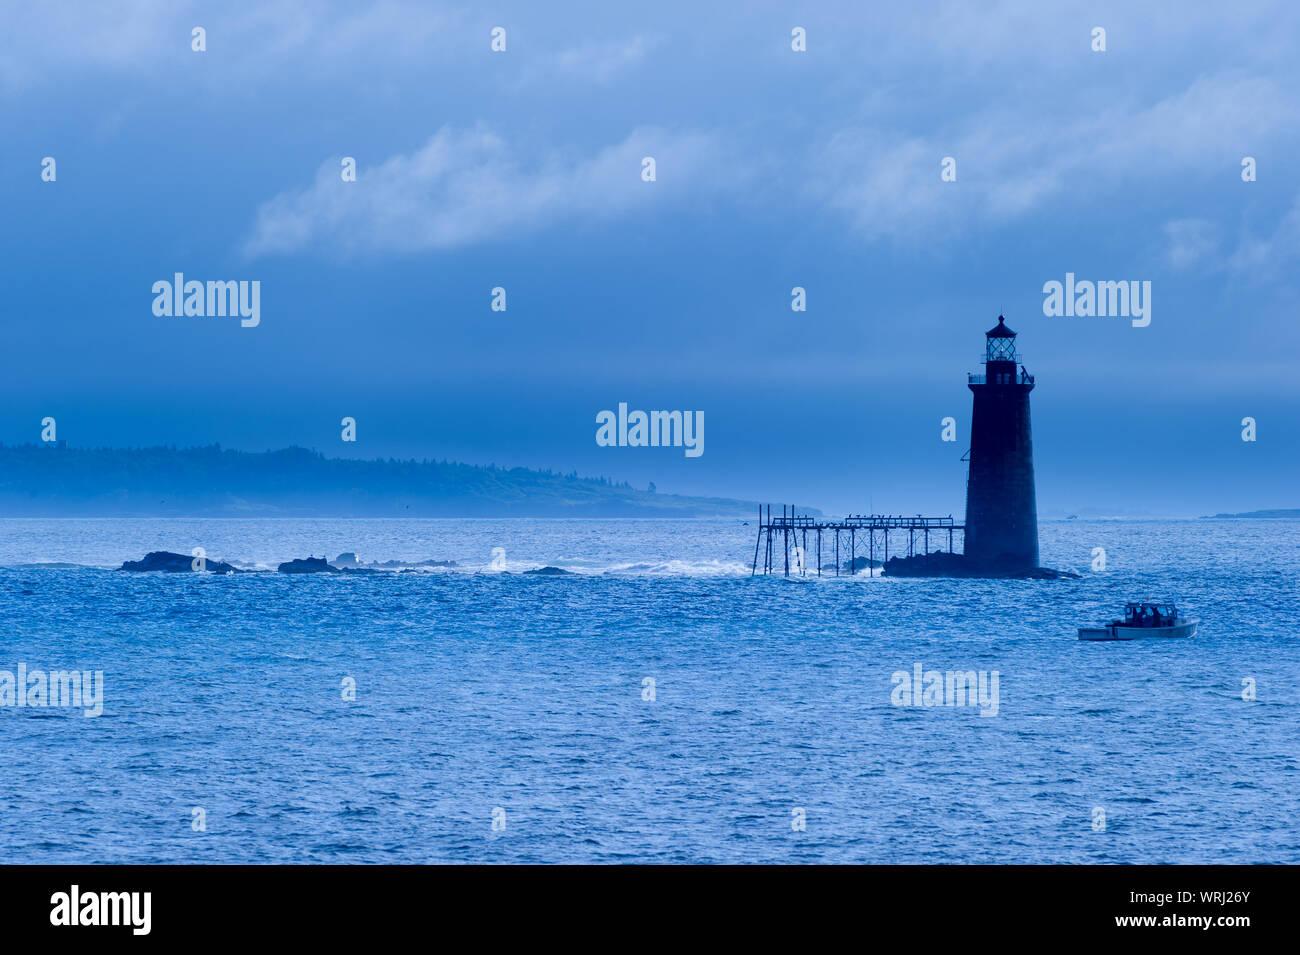 Fishing Boat Passing By Ram Island Ledge Lighthouse In Portland Maine Usa Stock Photo Alamy